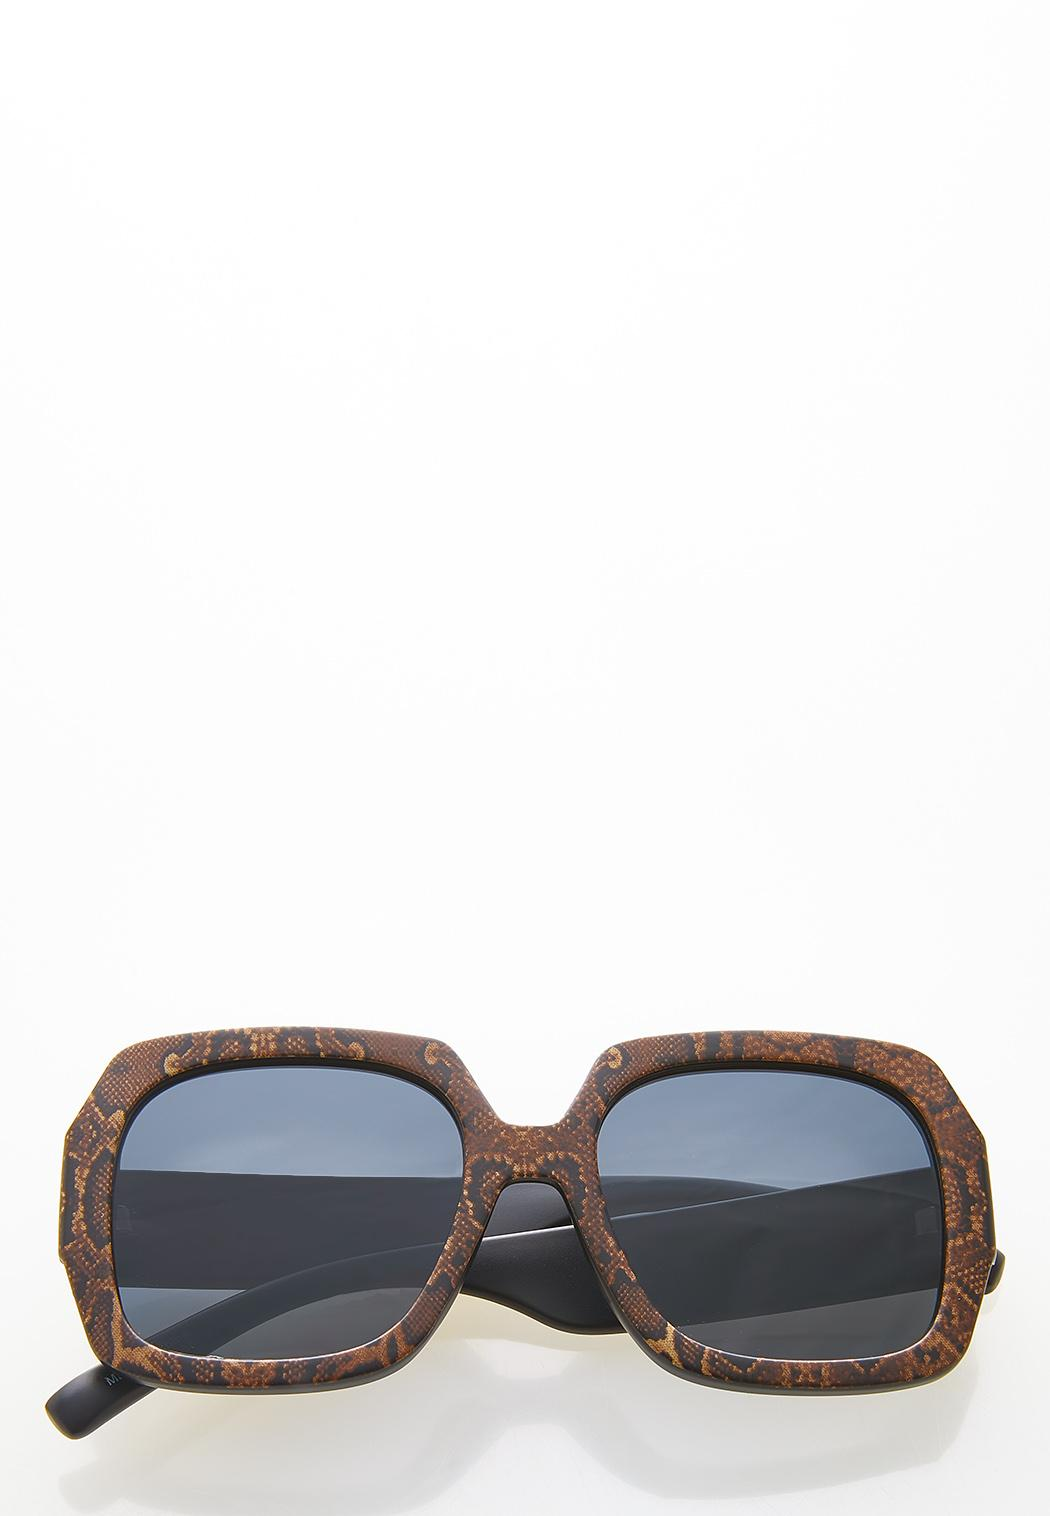 Snakeskin Square Sunglasses